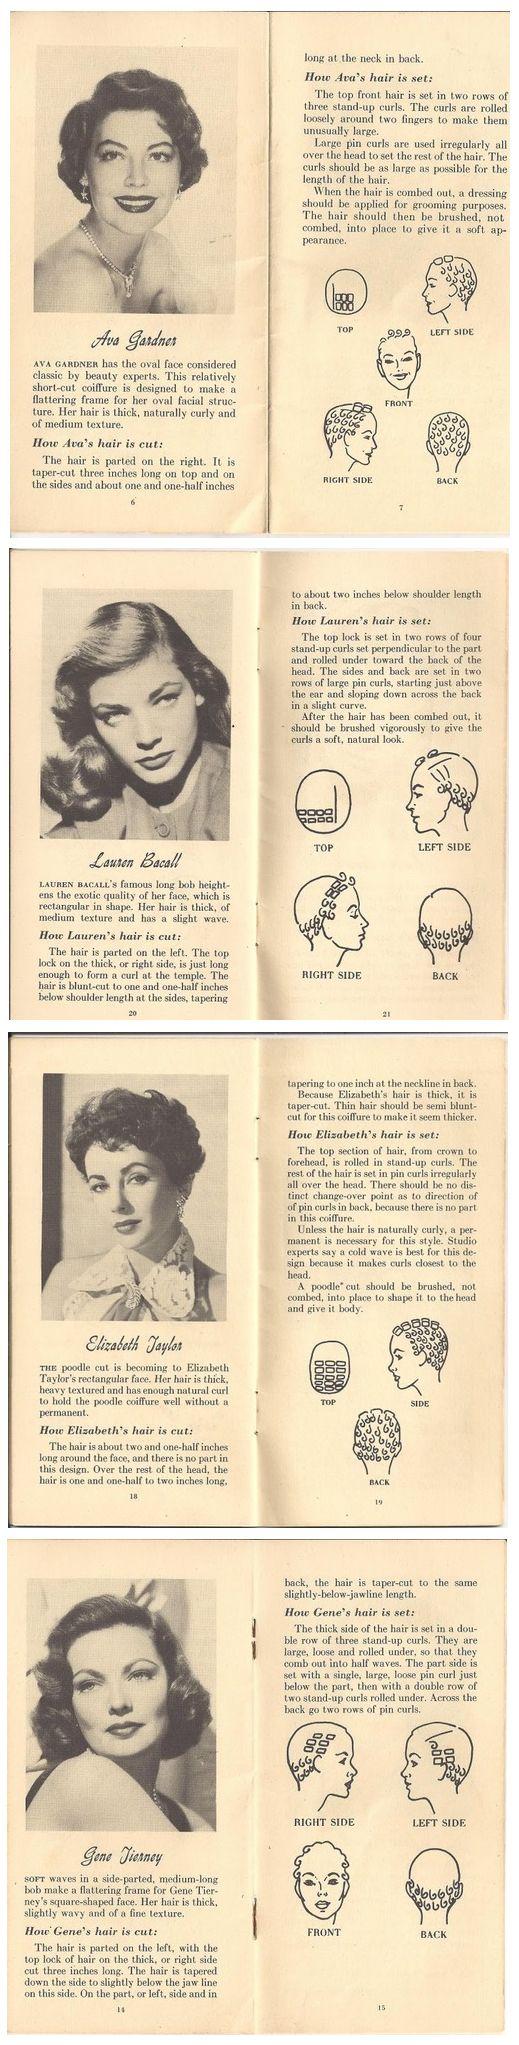 vintage pin curls diagram hydrolysis reaction aux belles choses: pinspiration monday - hair